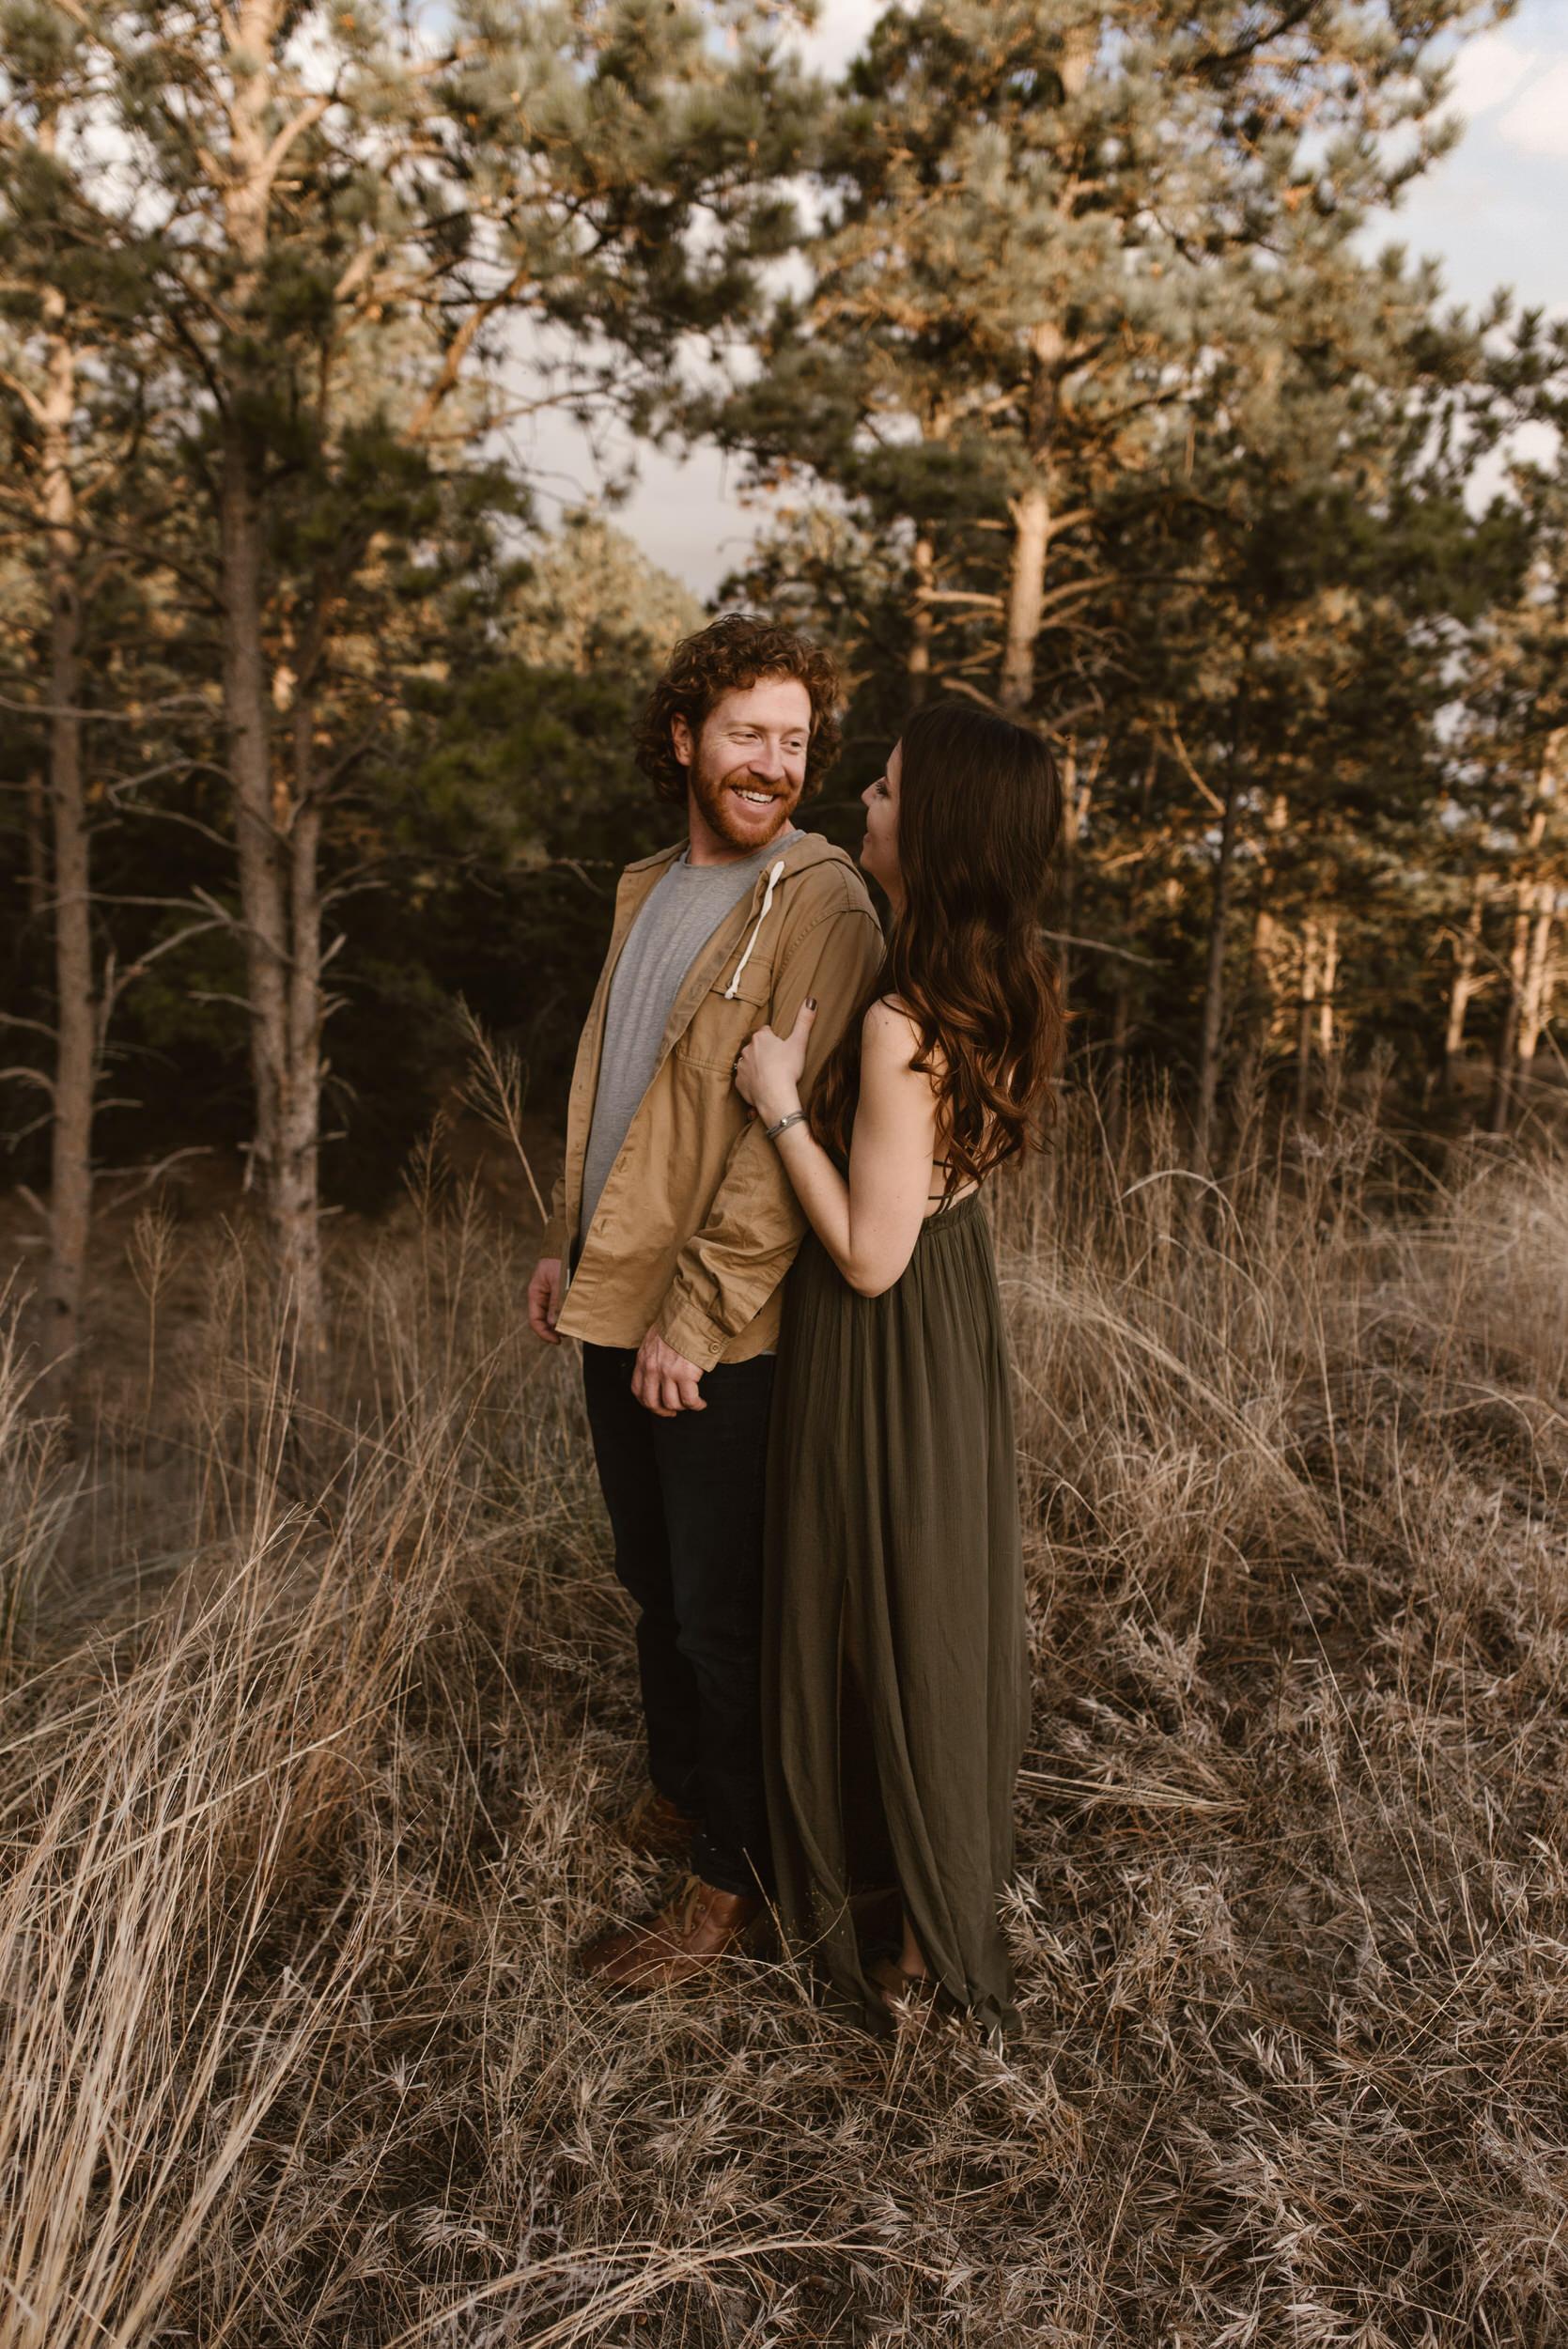 Nebraska-Engagement-Session-Halsey-Forest-Kaylie-Sirek-Photography-053.jpg